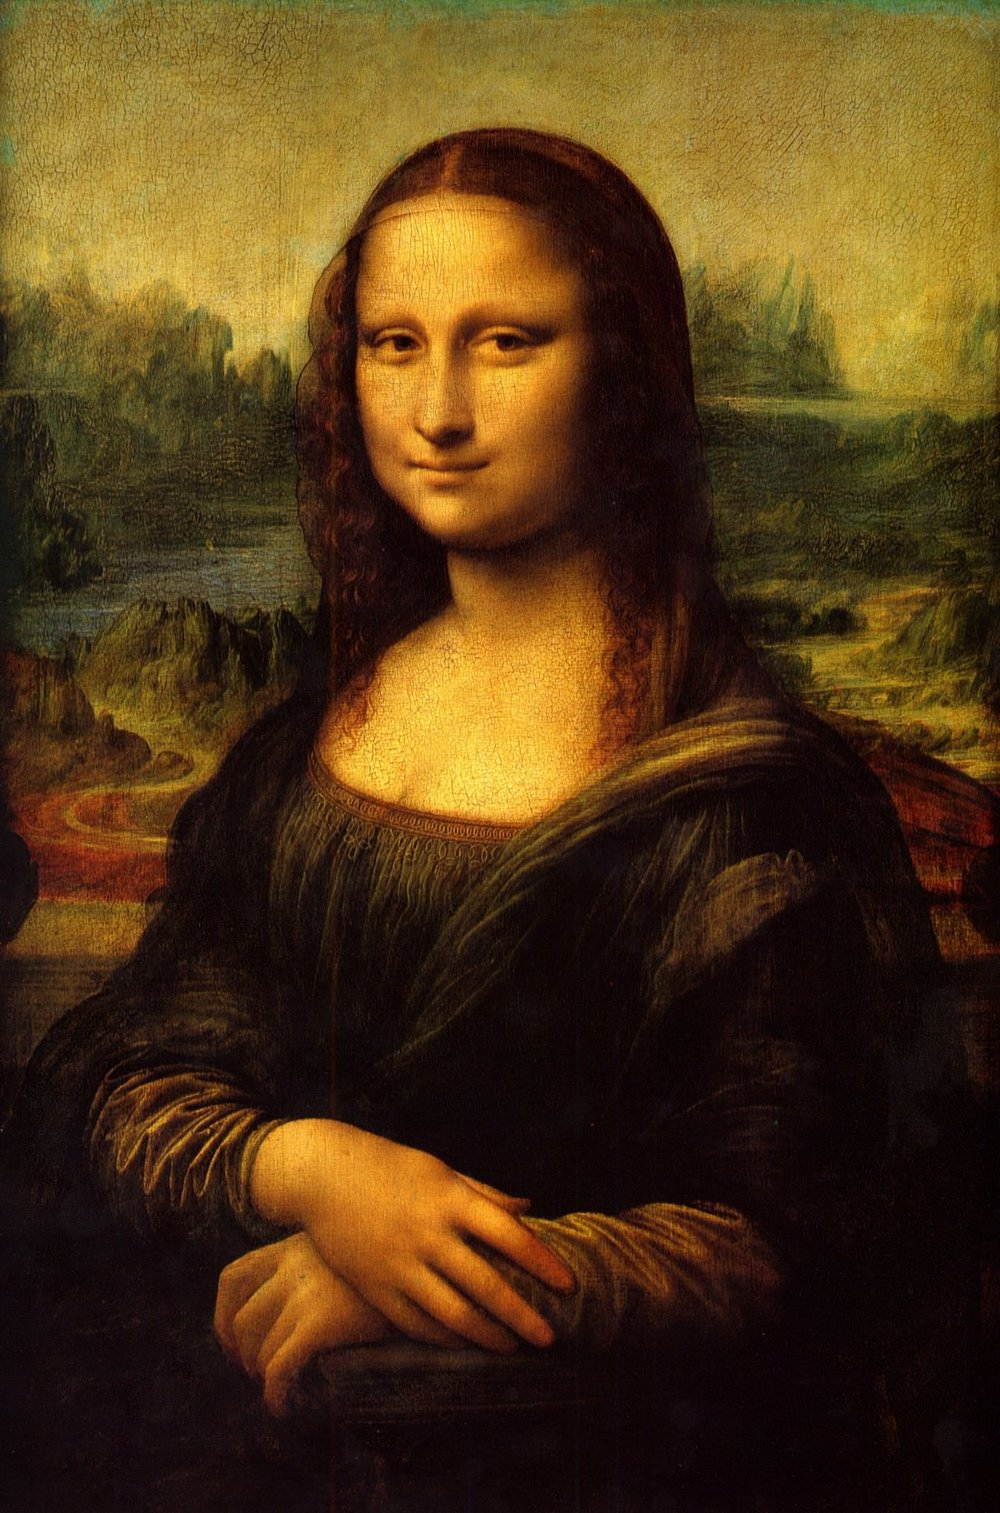 Mona Lisa by famous artist Leonardo da Vinci